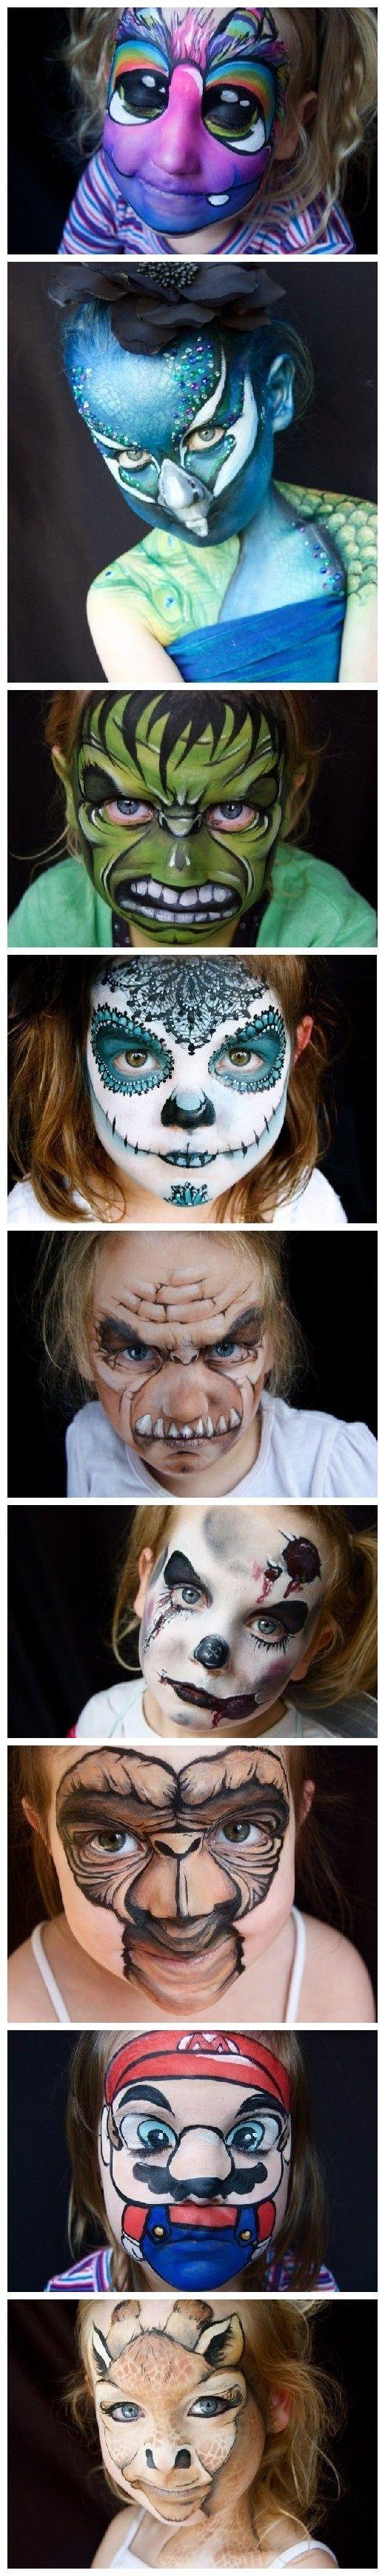 face Painted #Halloween #Halloween #halloween| http://welcometohalloween.lemoncoin.org